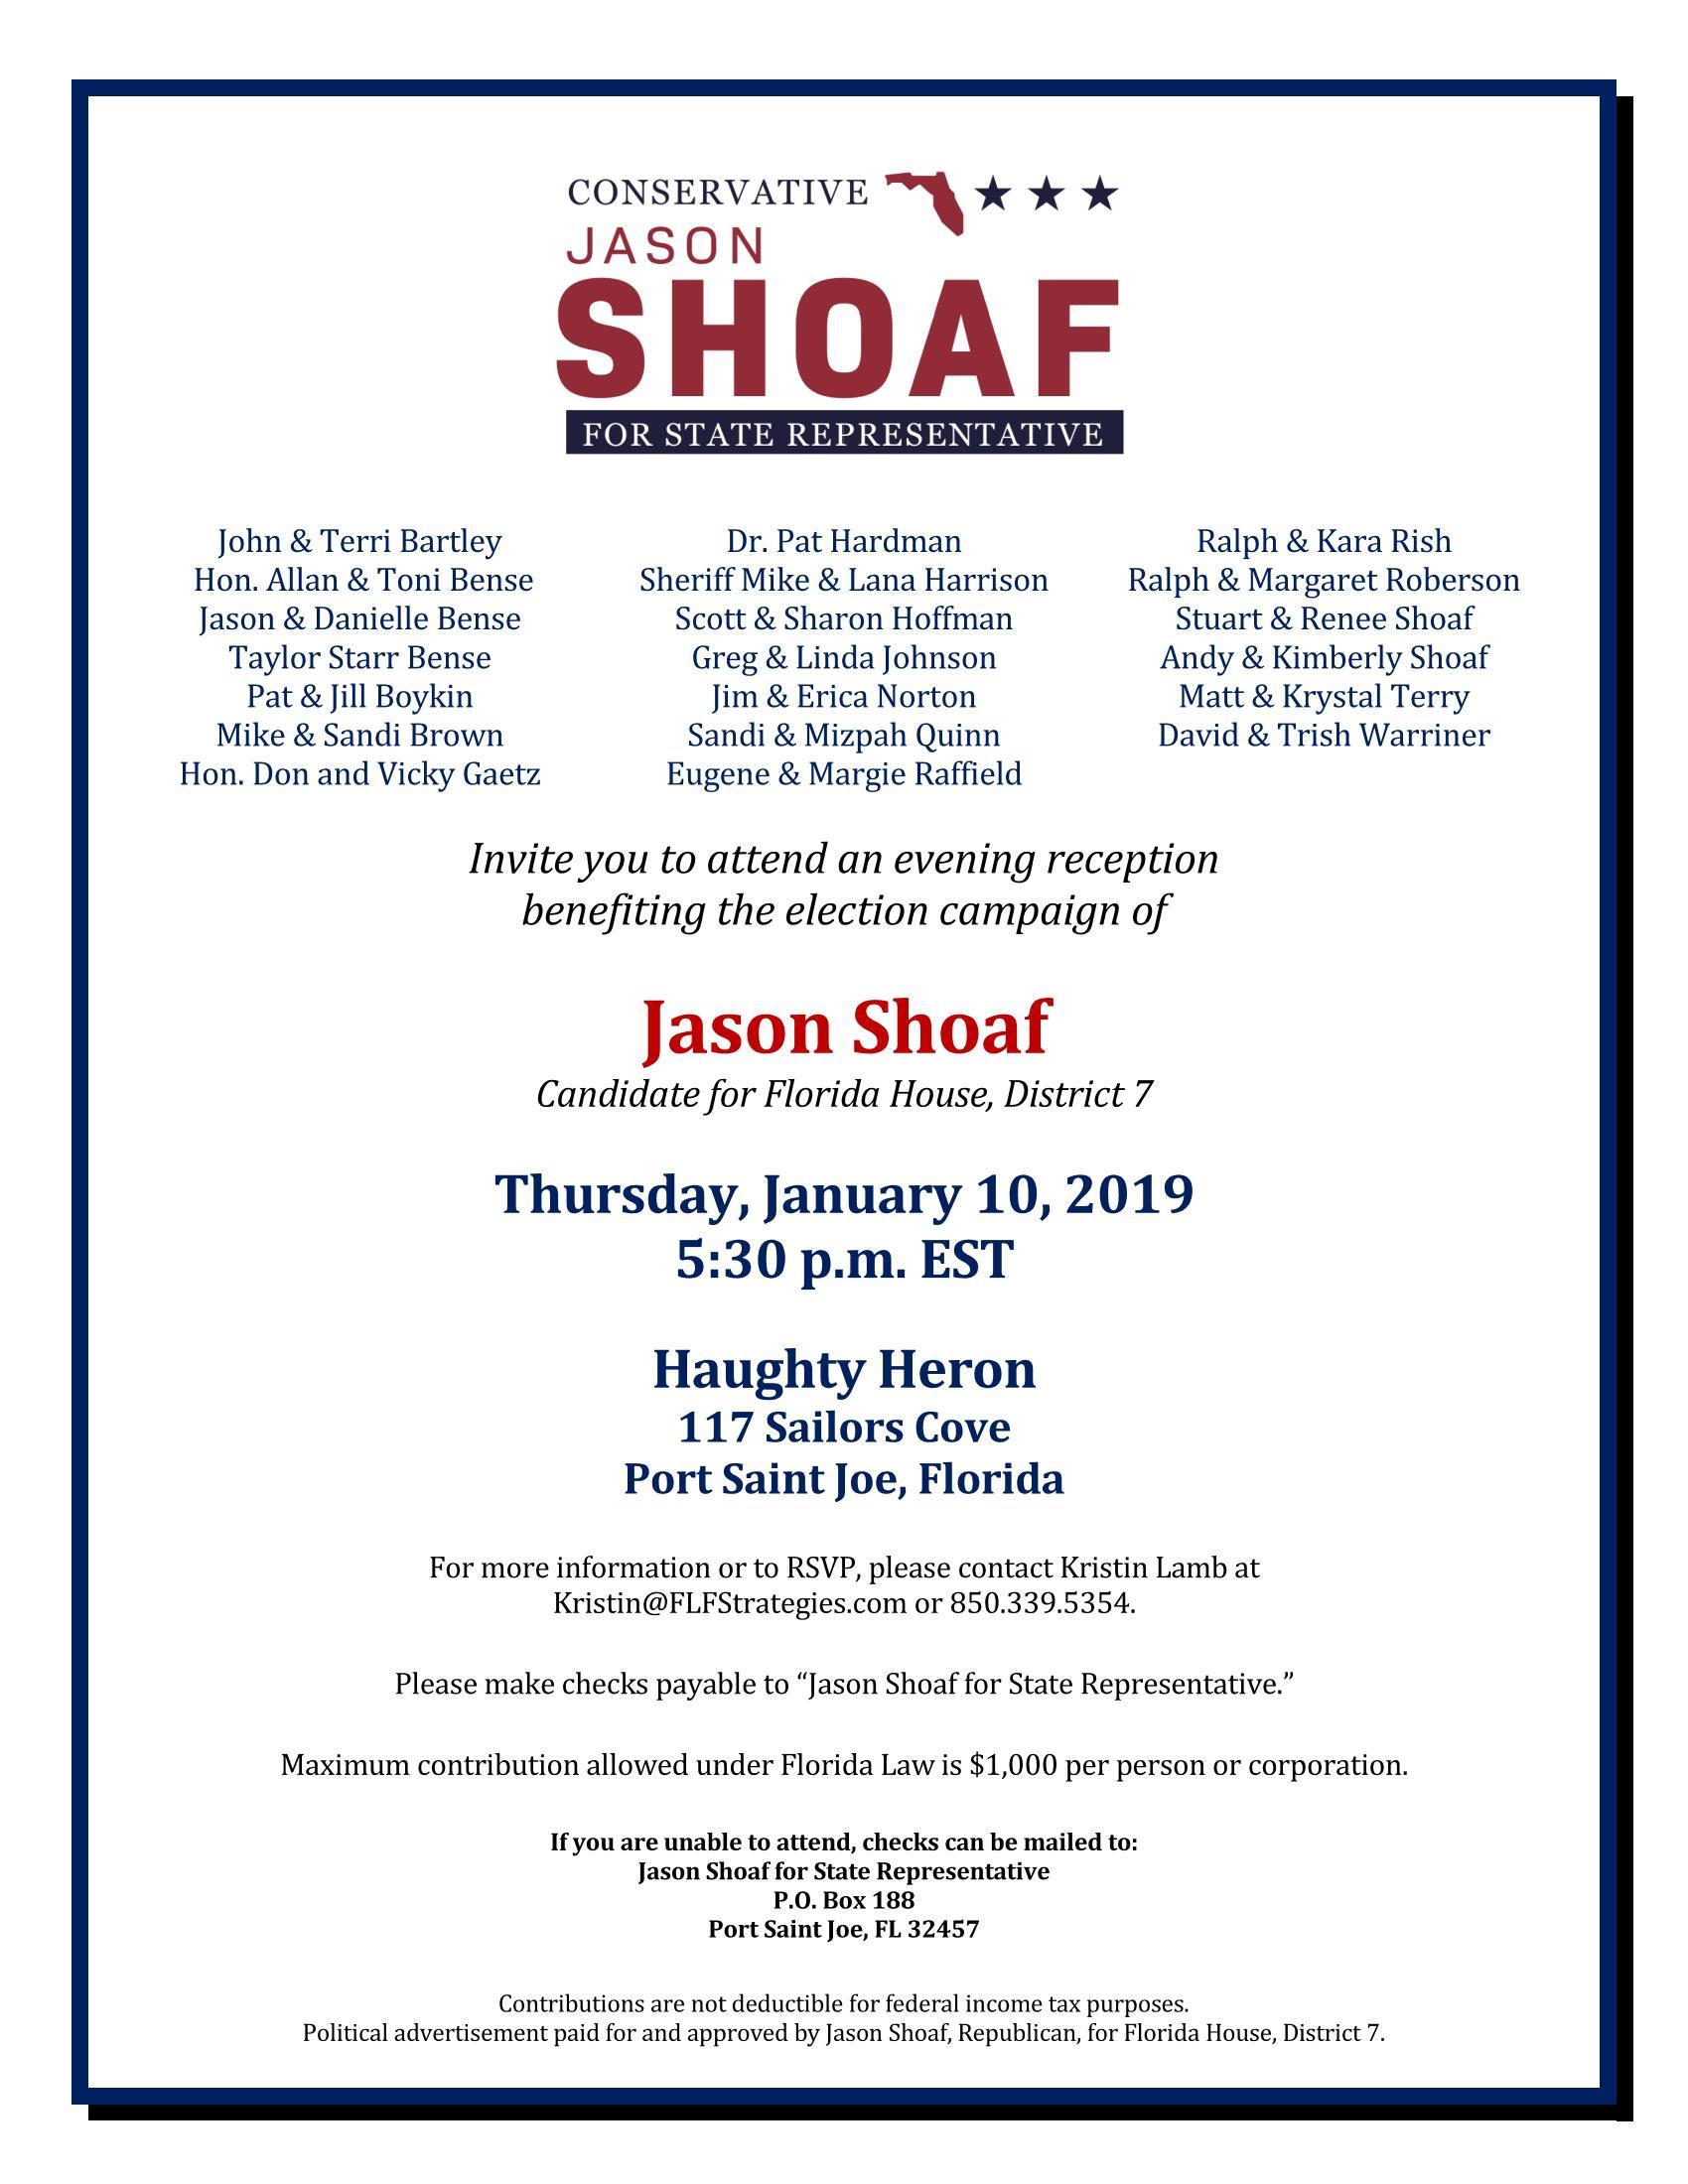 Jason Shoaf Fundraiser